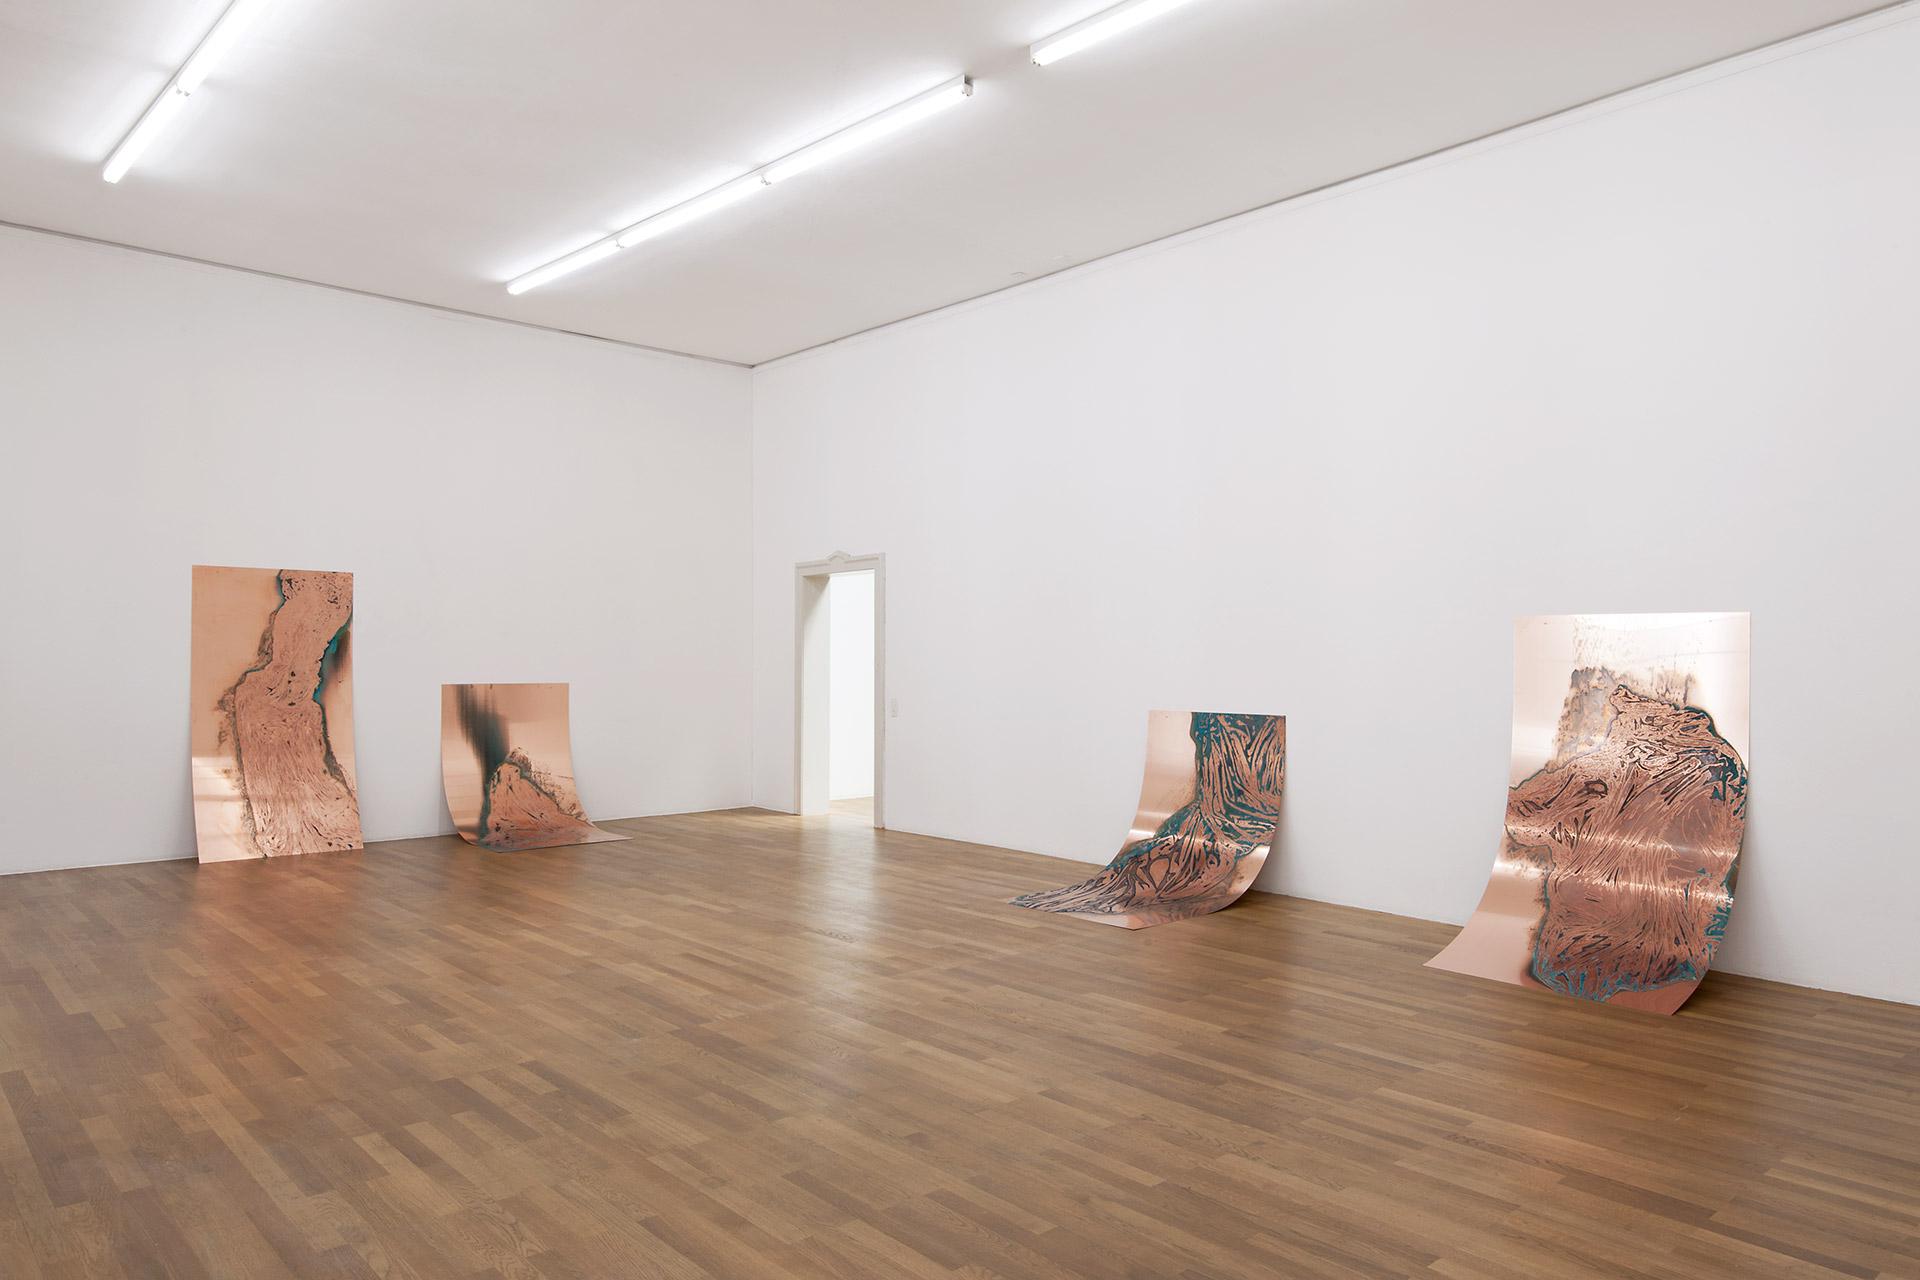 Kopie von Una-Szeemann-Kunsthalle-Winterthur-2018-1